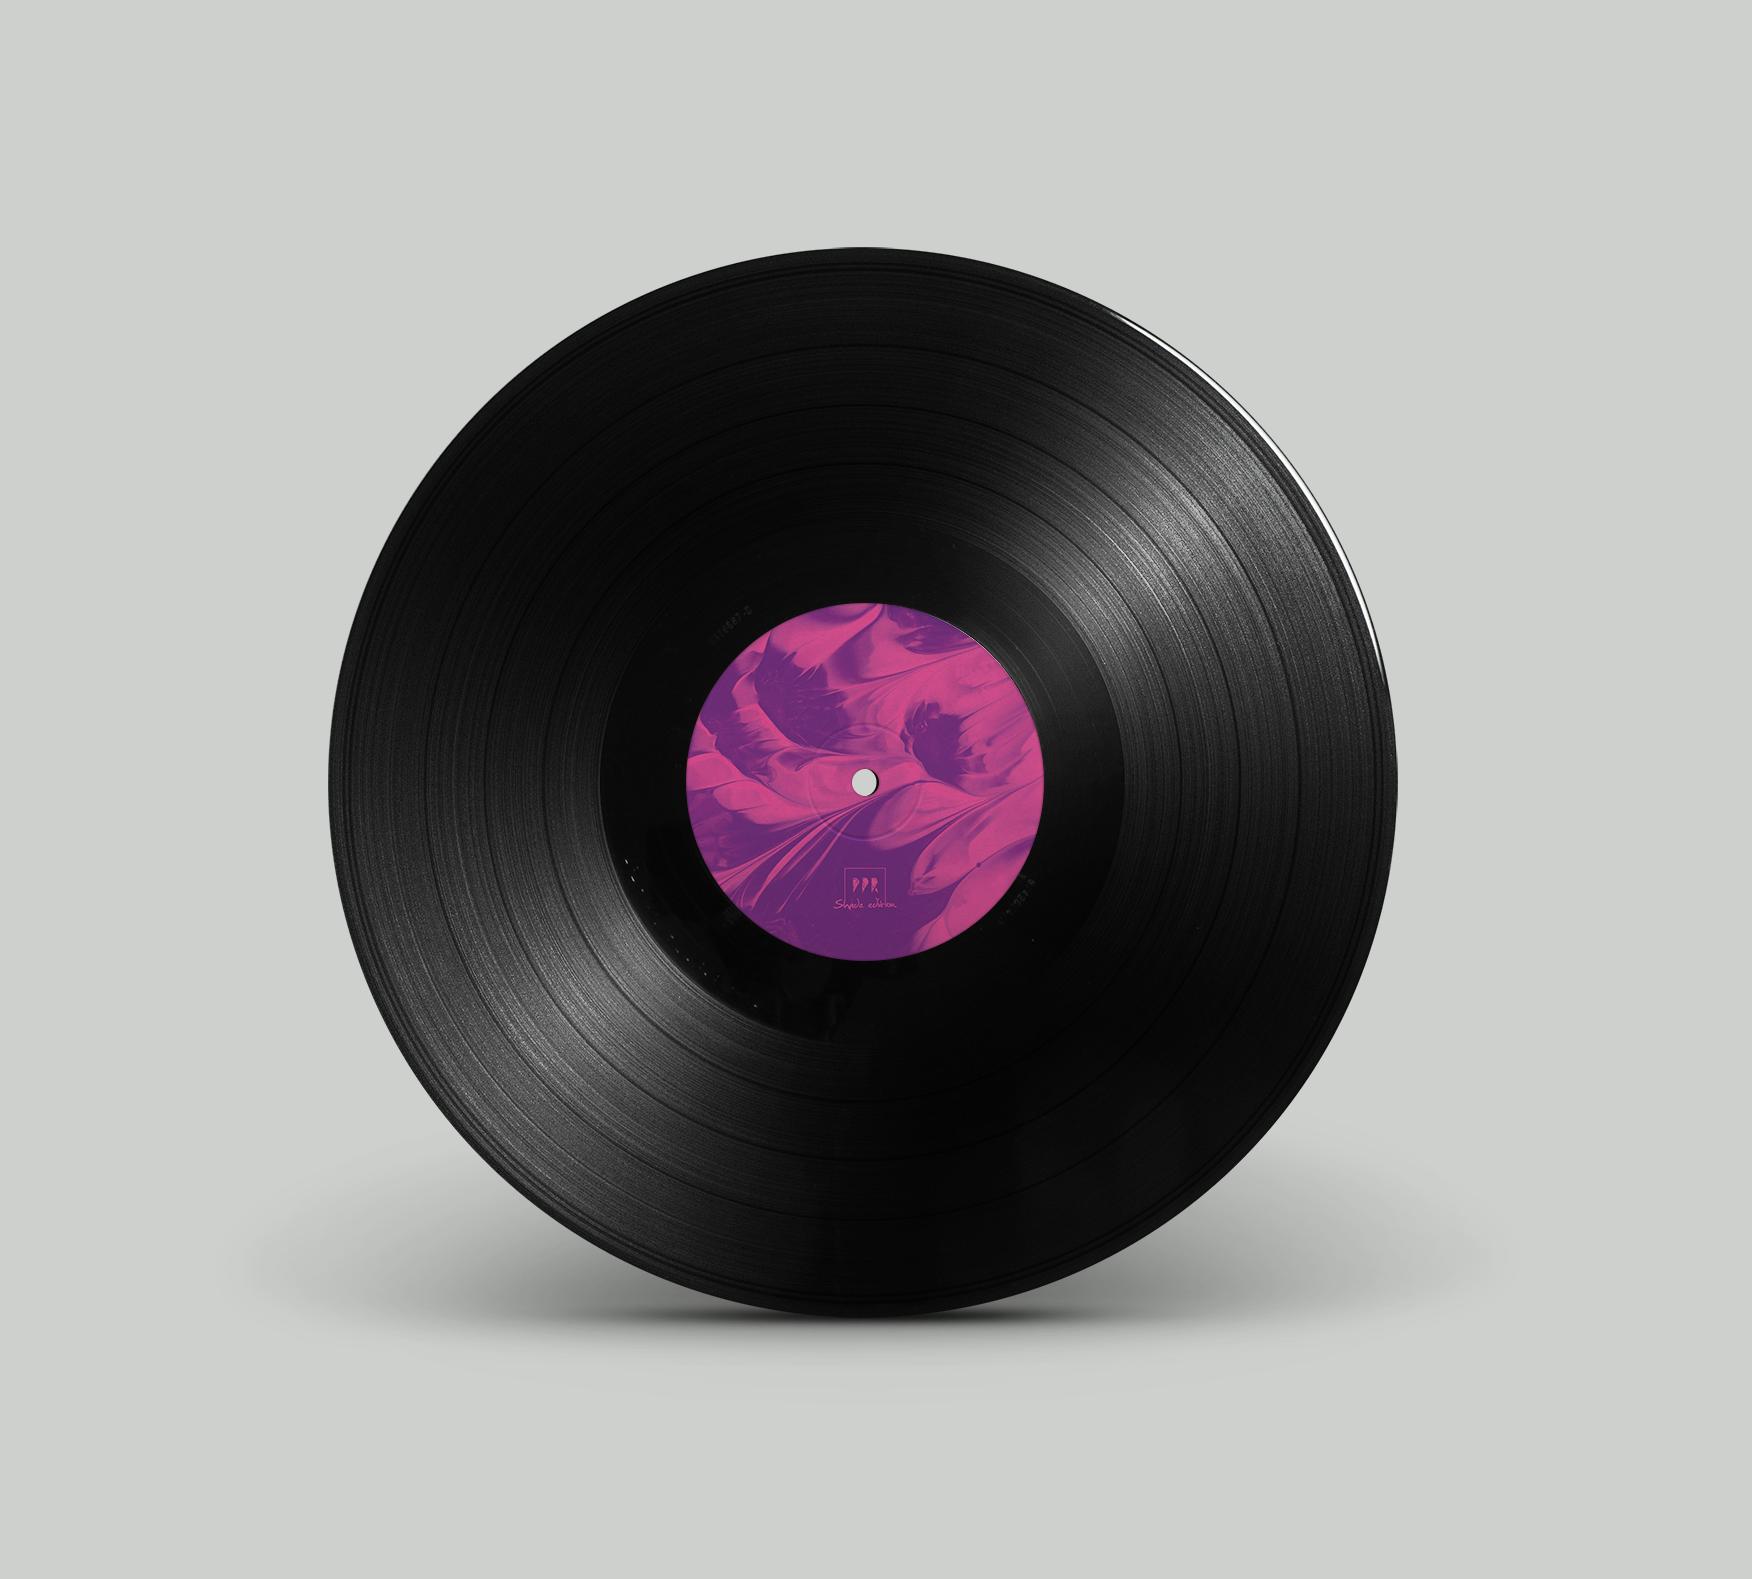 PPR Shade Edition – Painting vinyl visual